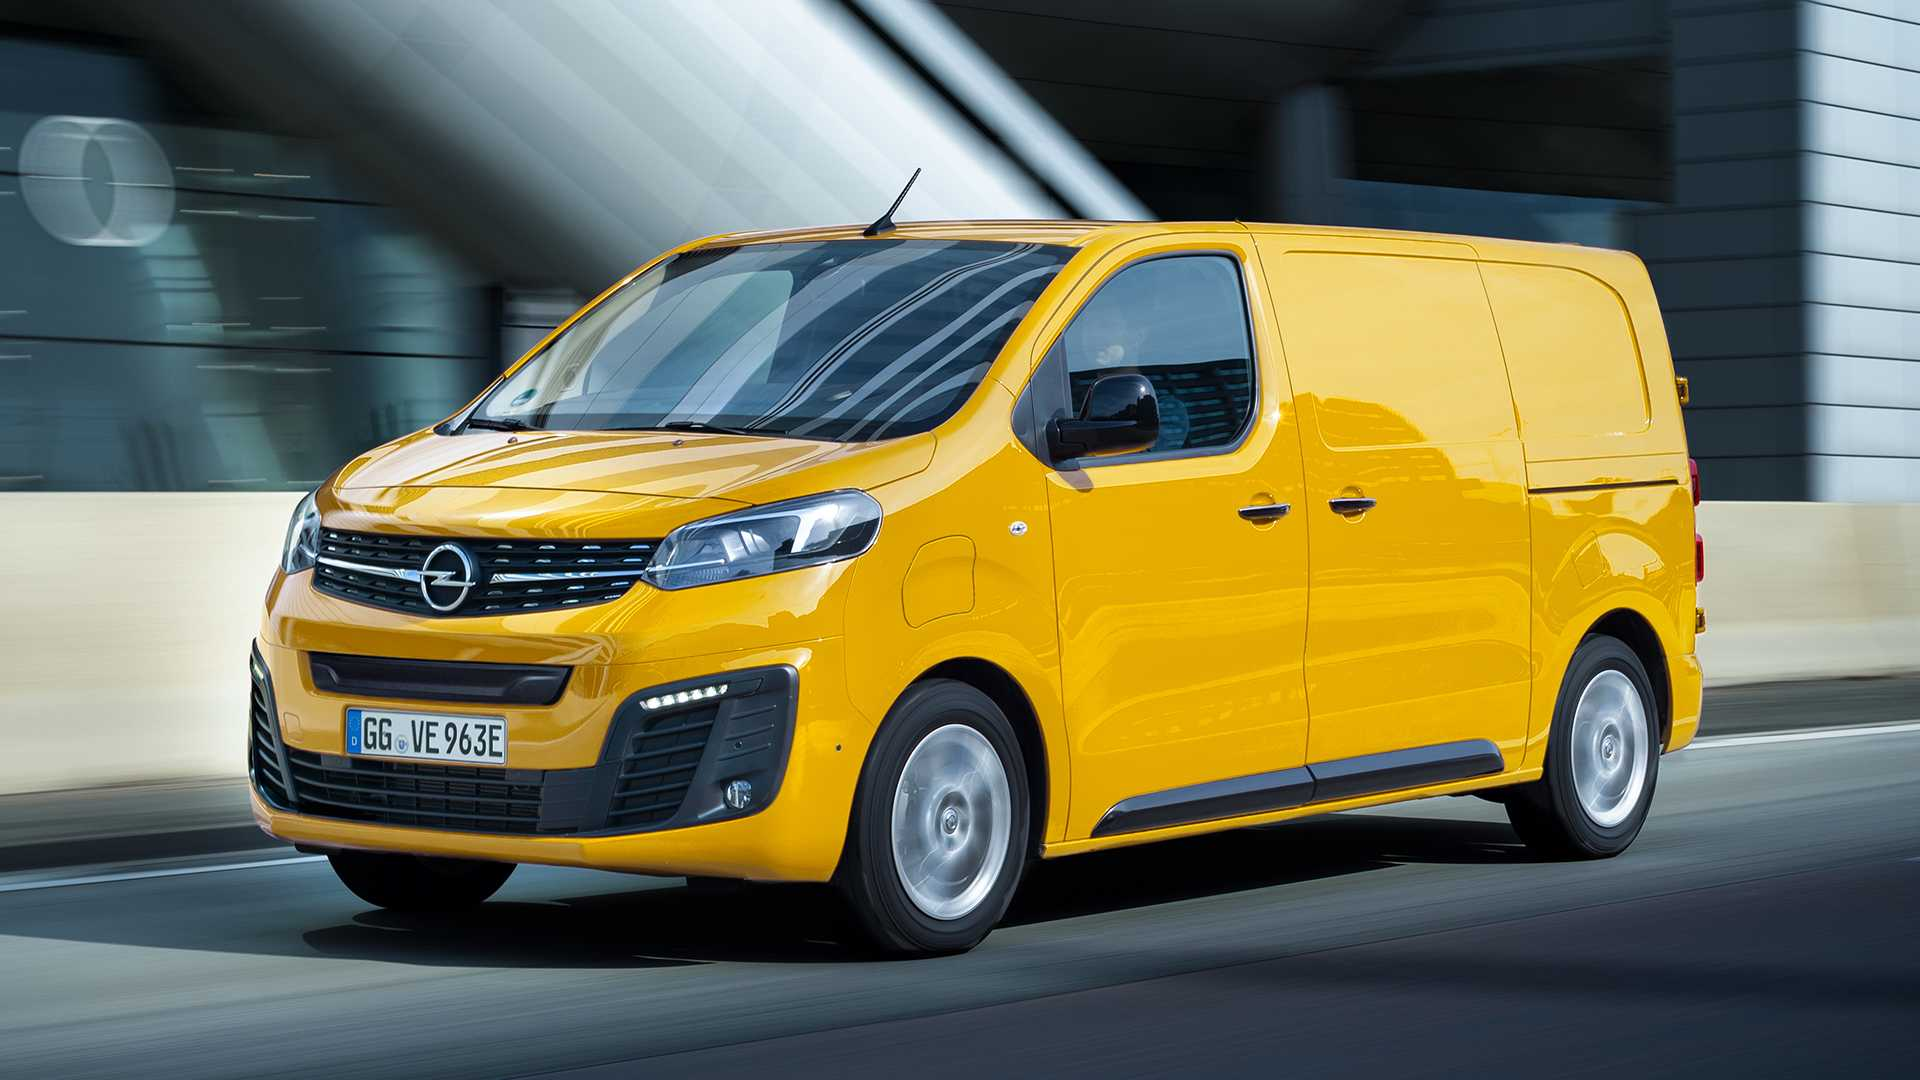 2020 Opel Vivaro Review